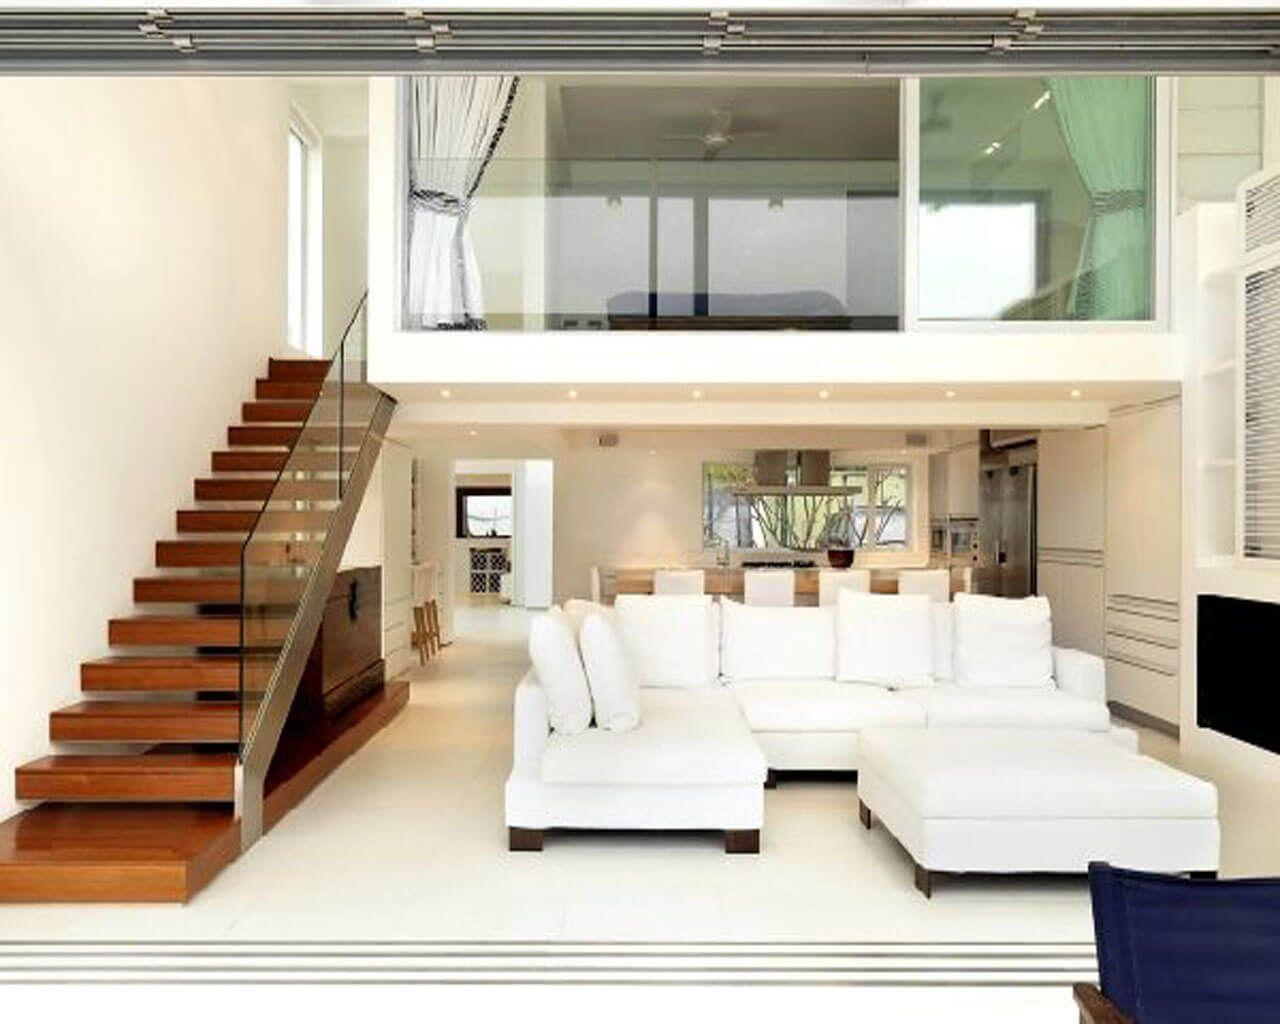 The Best Impressive Small House Design From Inside Loft House Loft Design Modern Home Interior Design